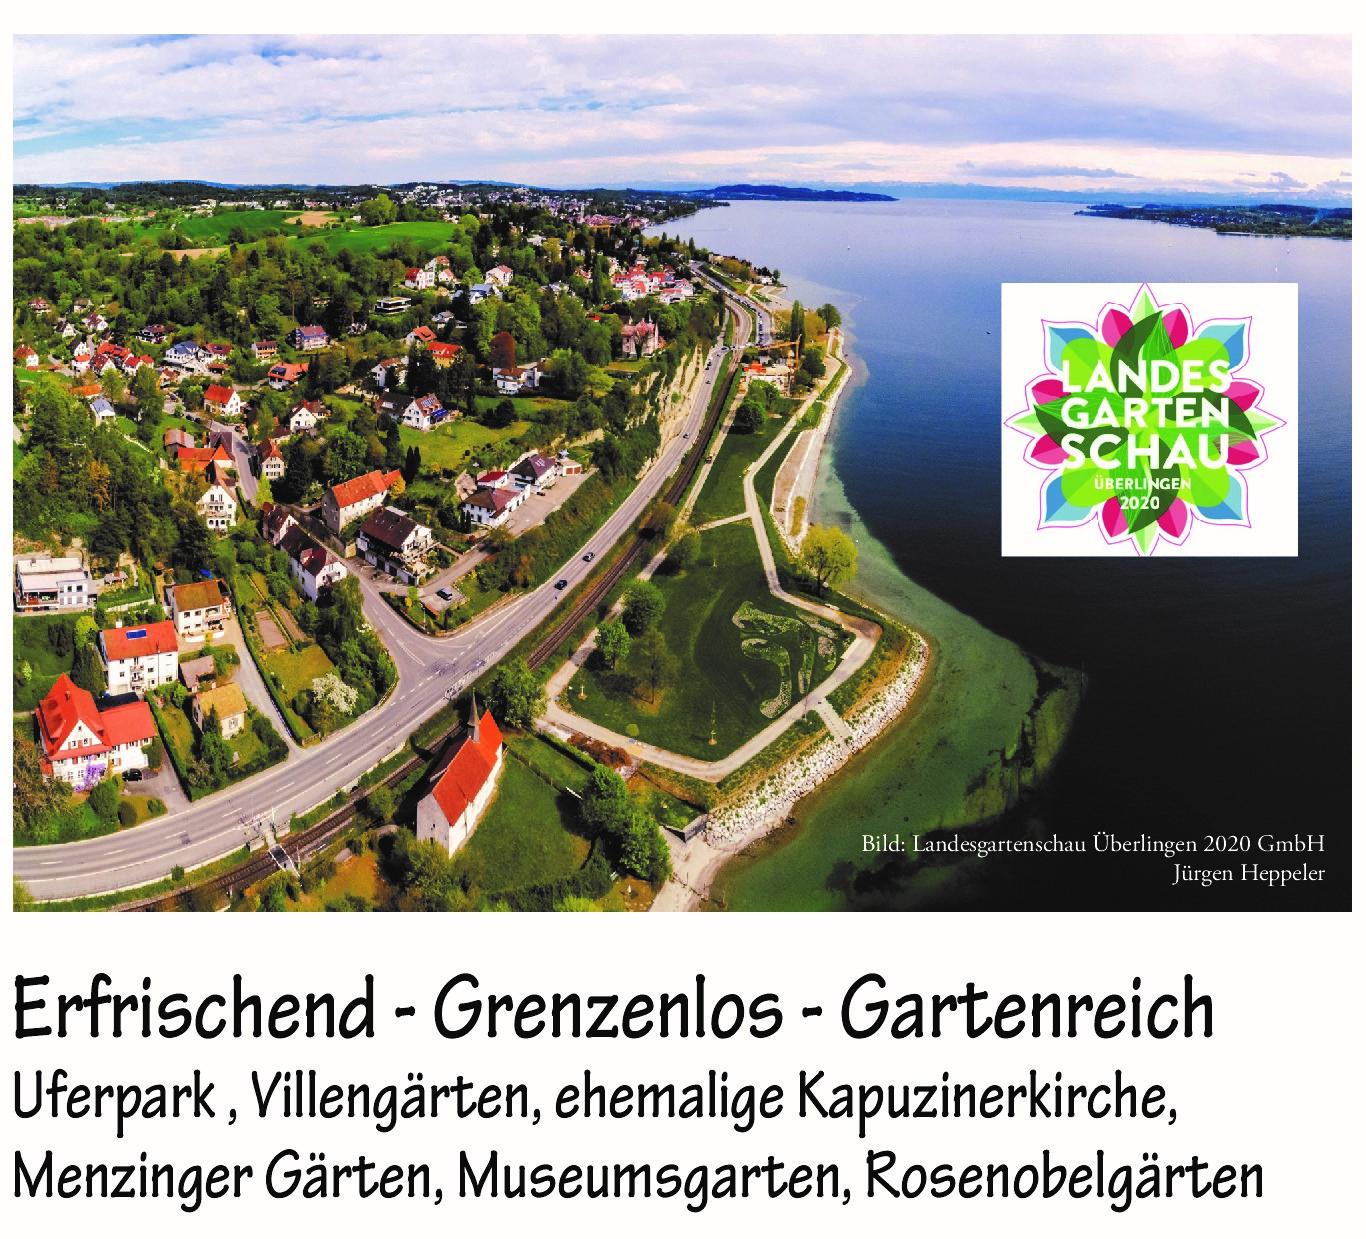 2020.1-Busreise-Landesgartenschau-A4.jpg